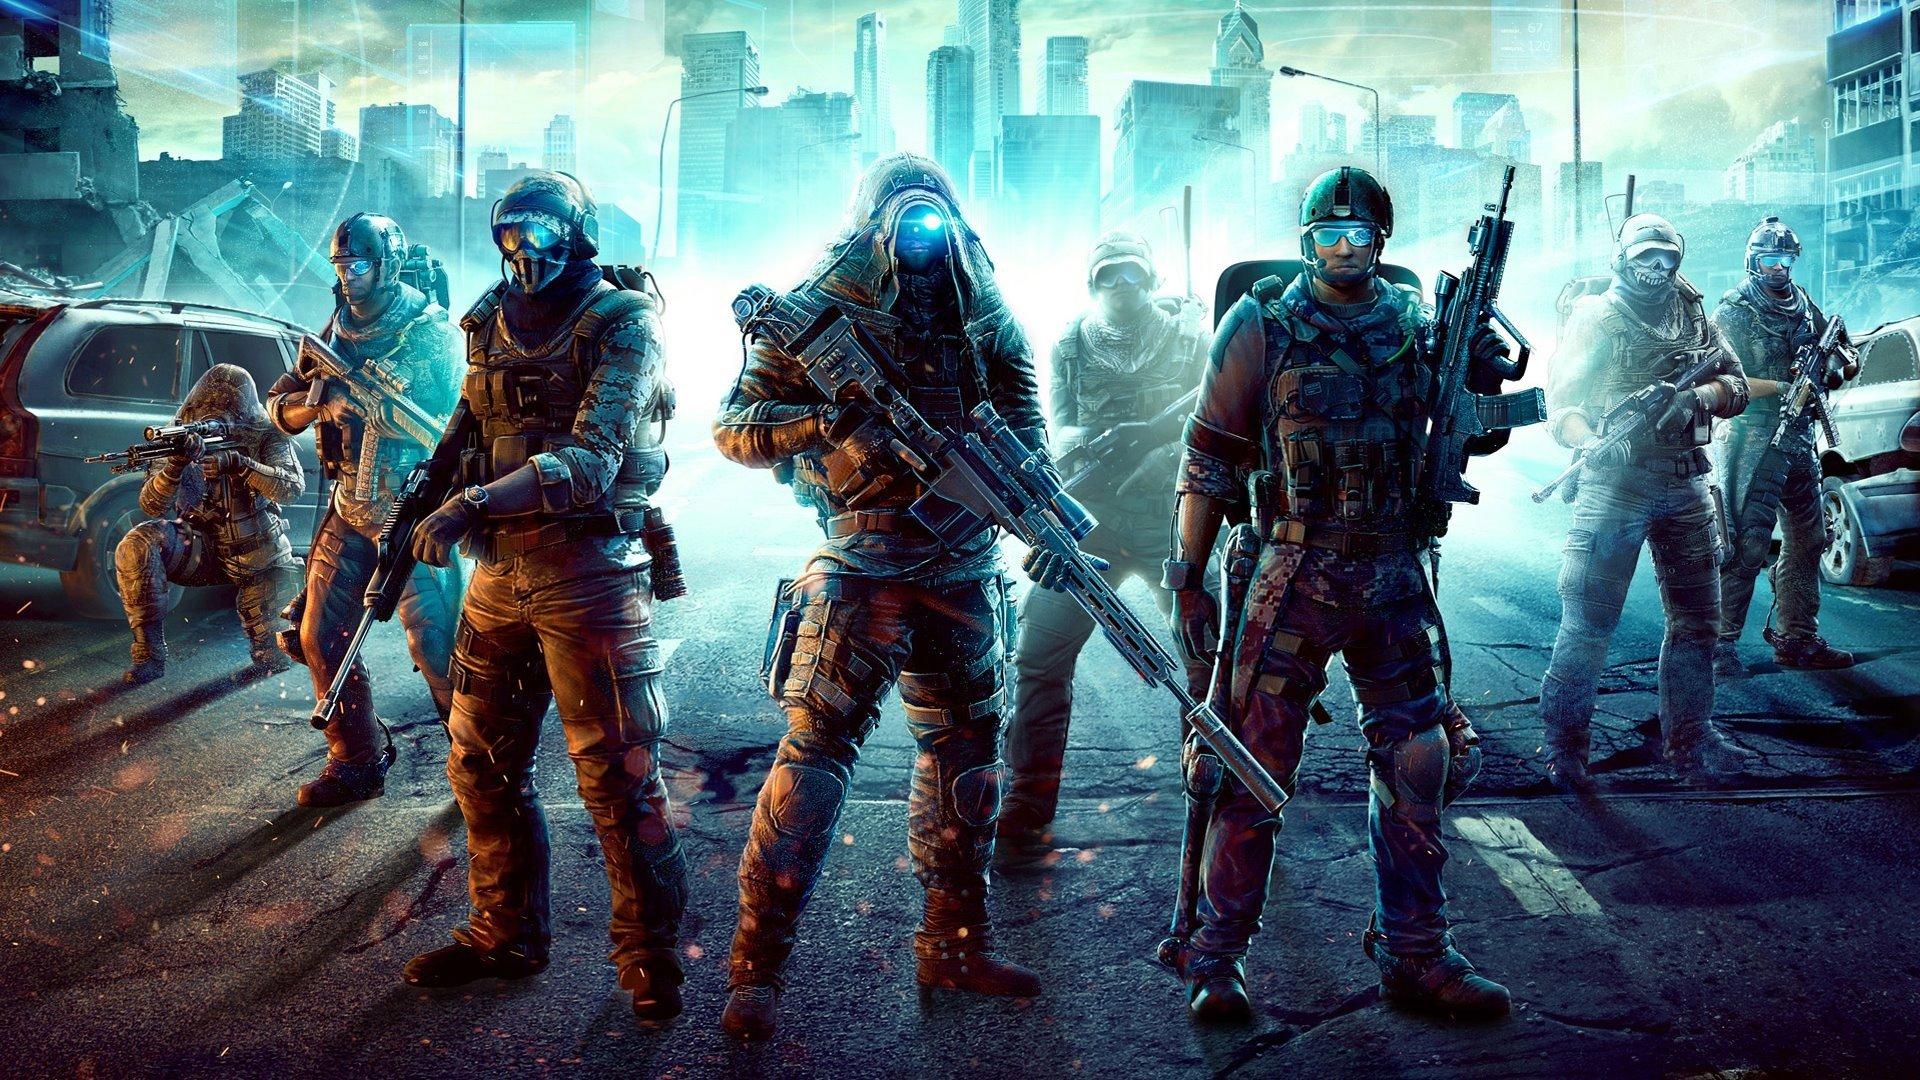 Ghost Recon Future Soldier Hd Wallpaper Tom Clancy S Ghost Recon Phantoms Hd Wallpaper